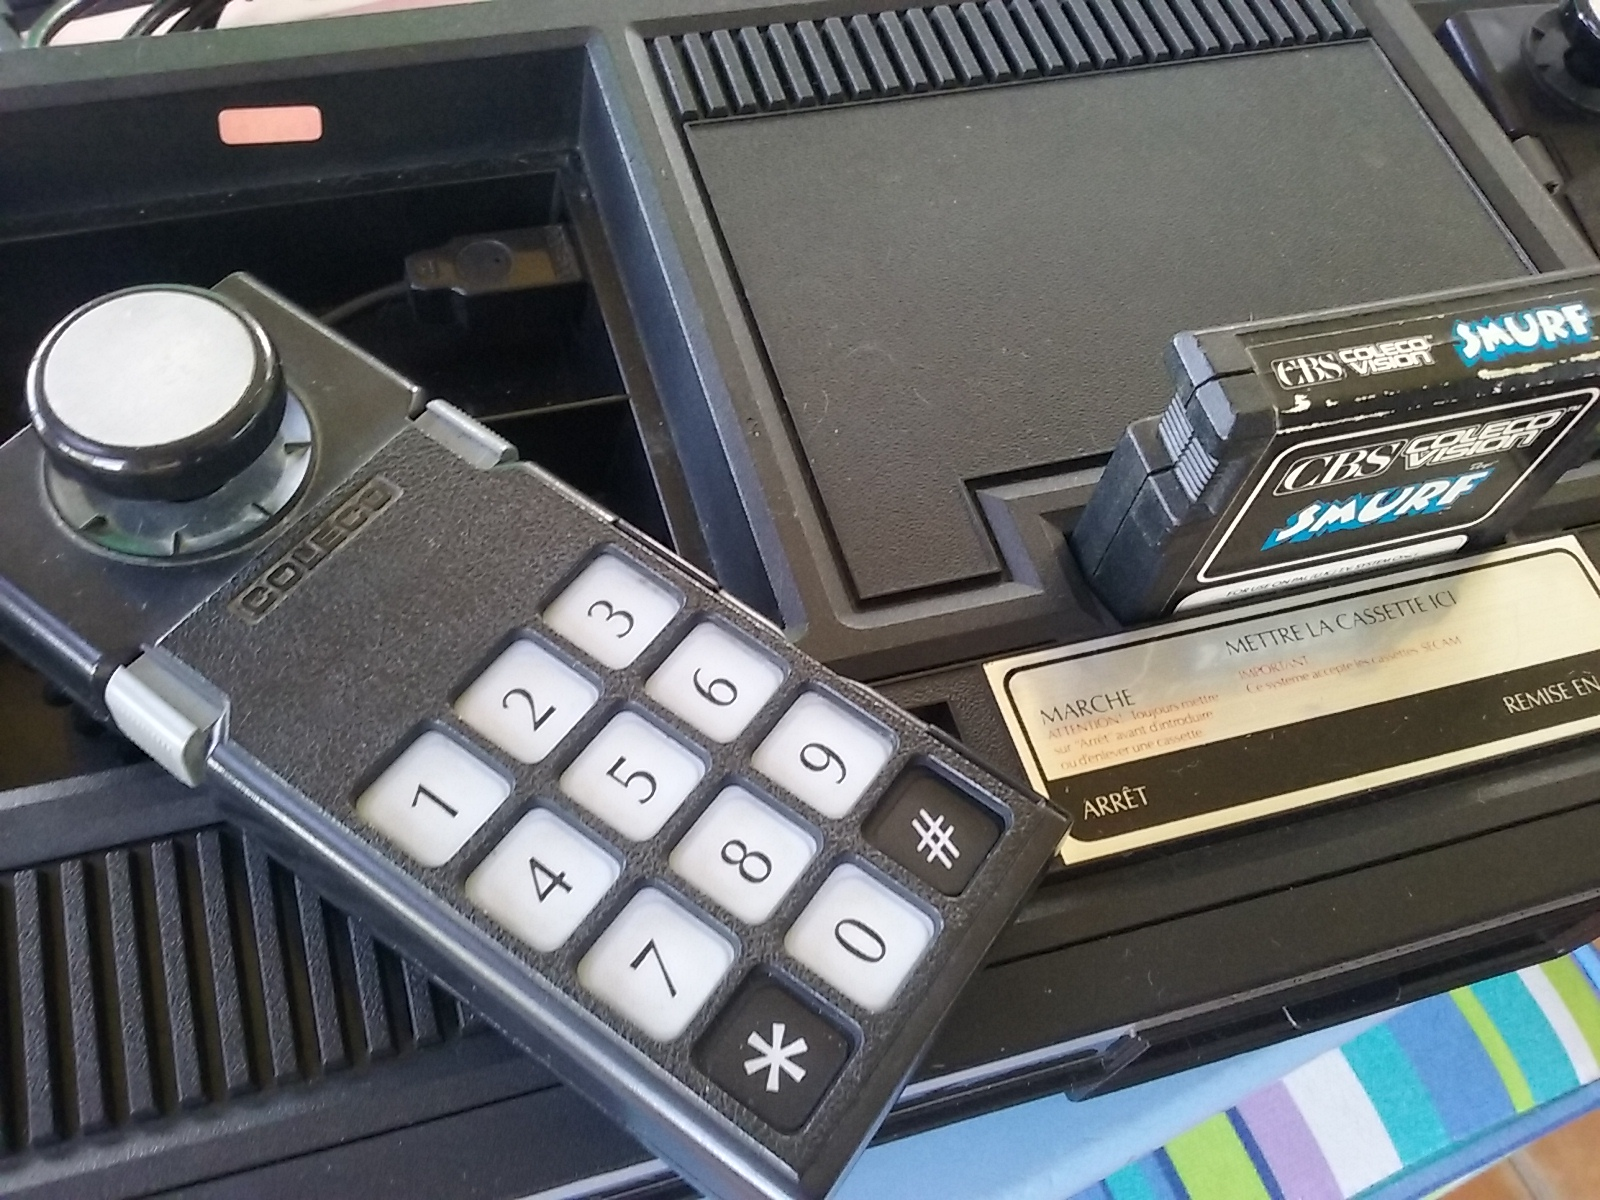 Colecovision2.jpg